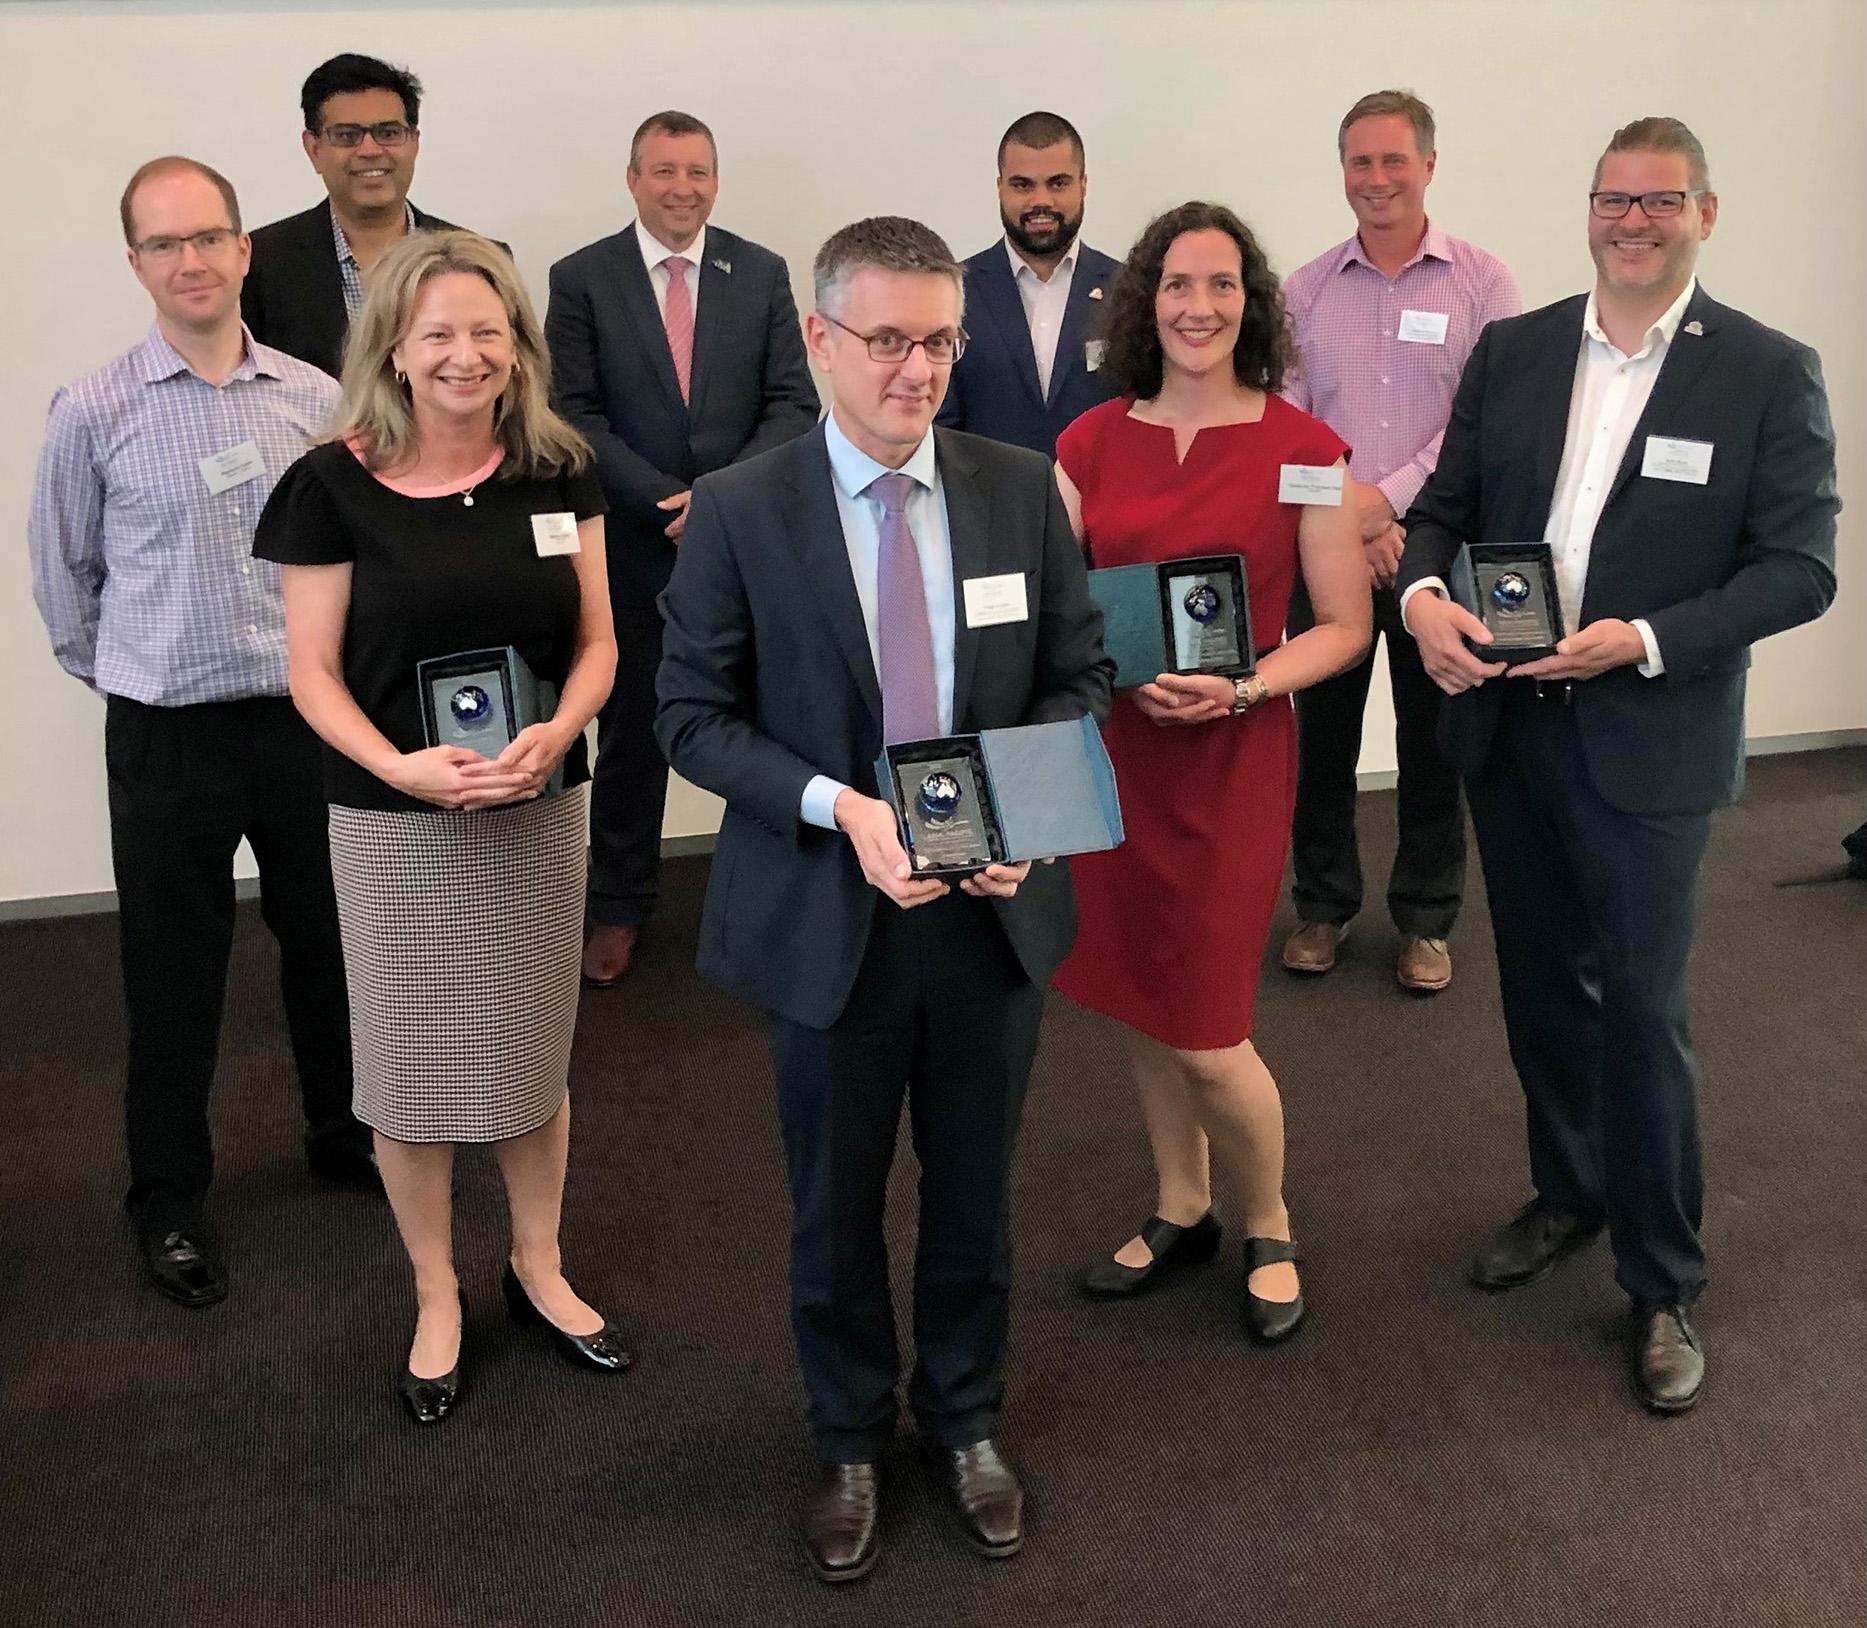 Group photo of APSEA award winners